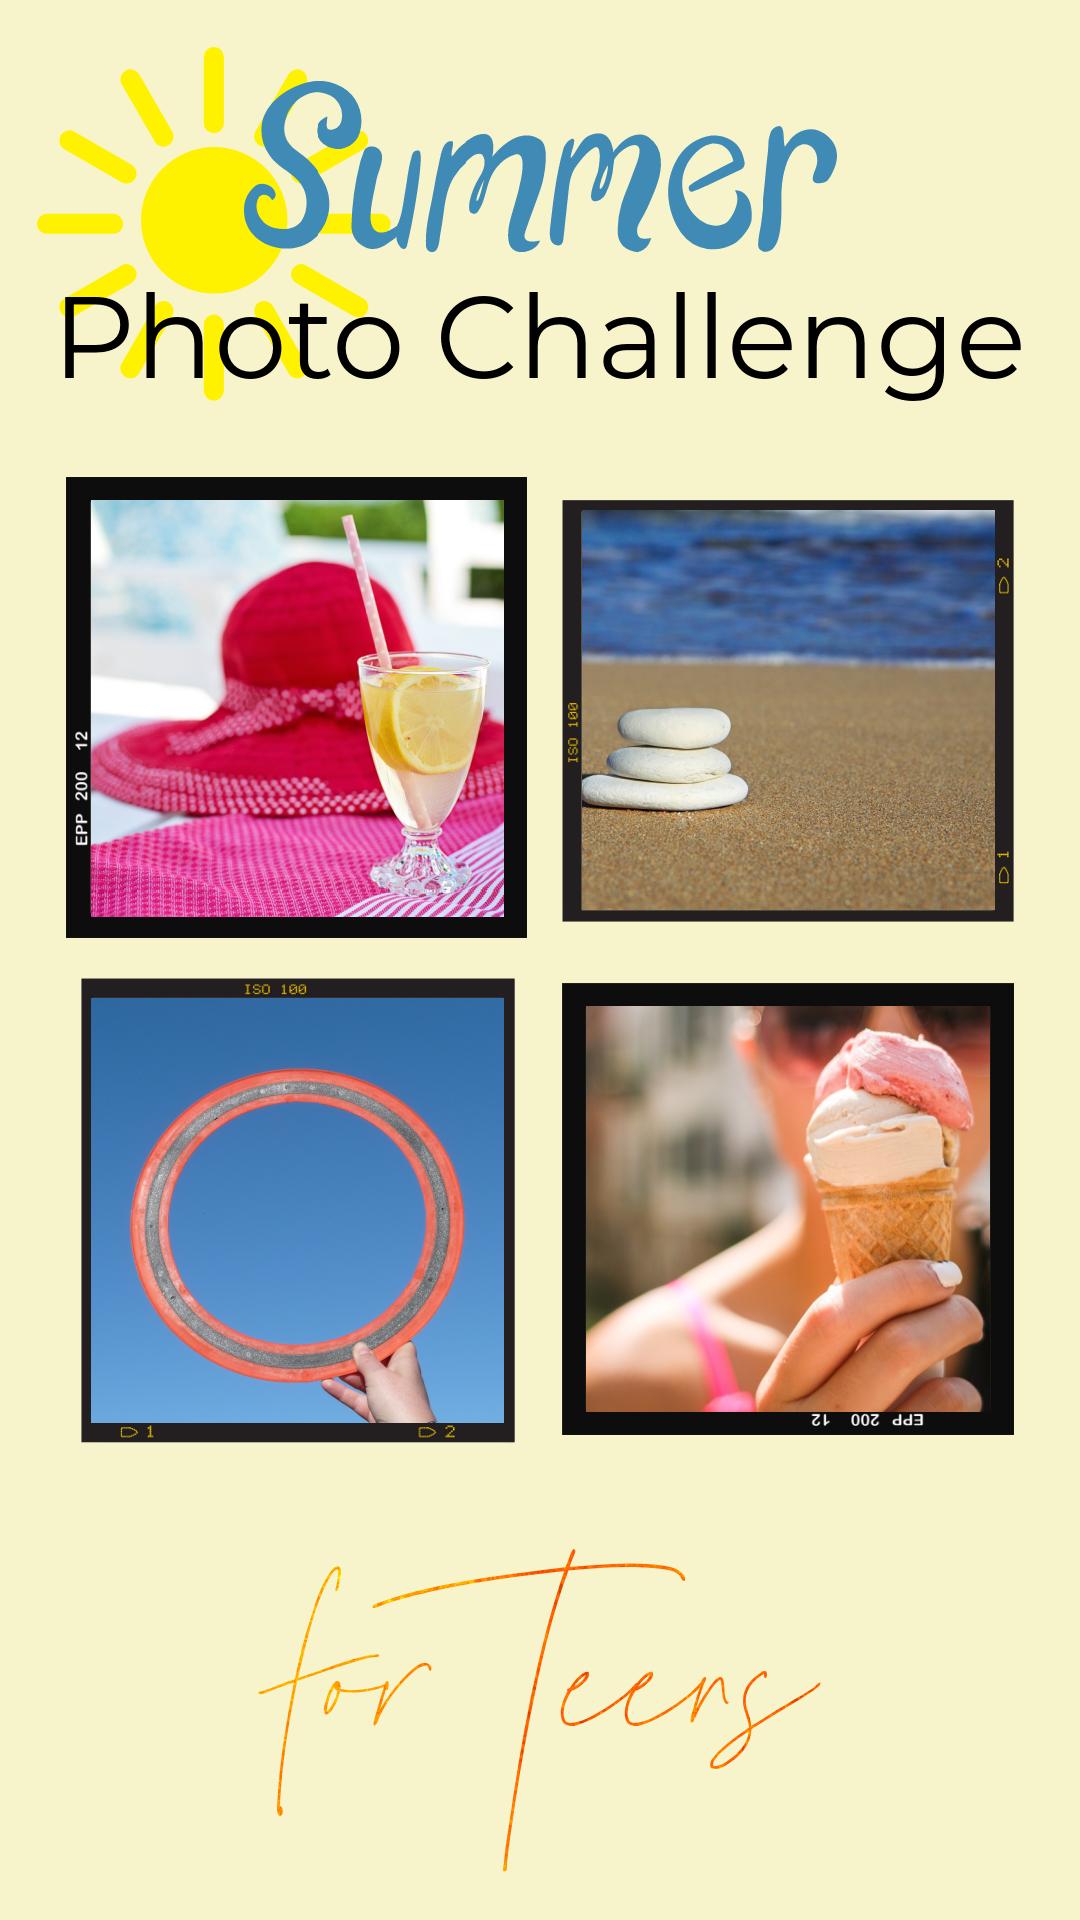 Summer Photo Challenge for Teens